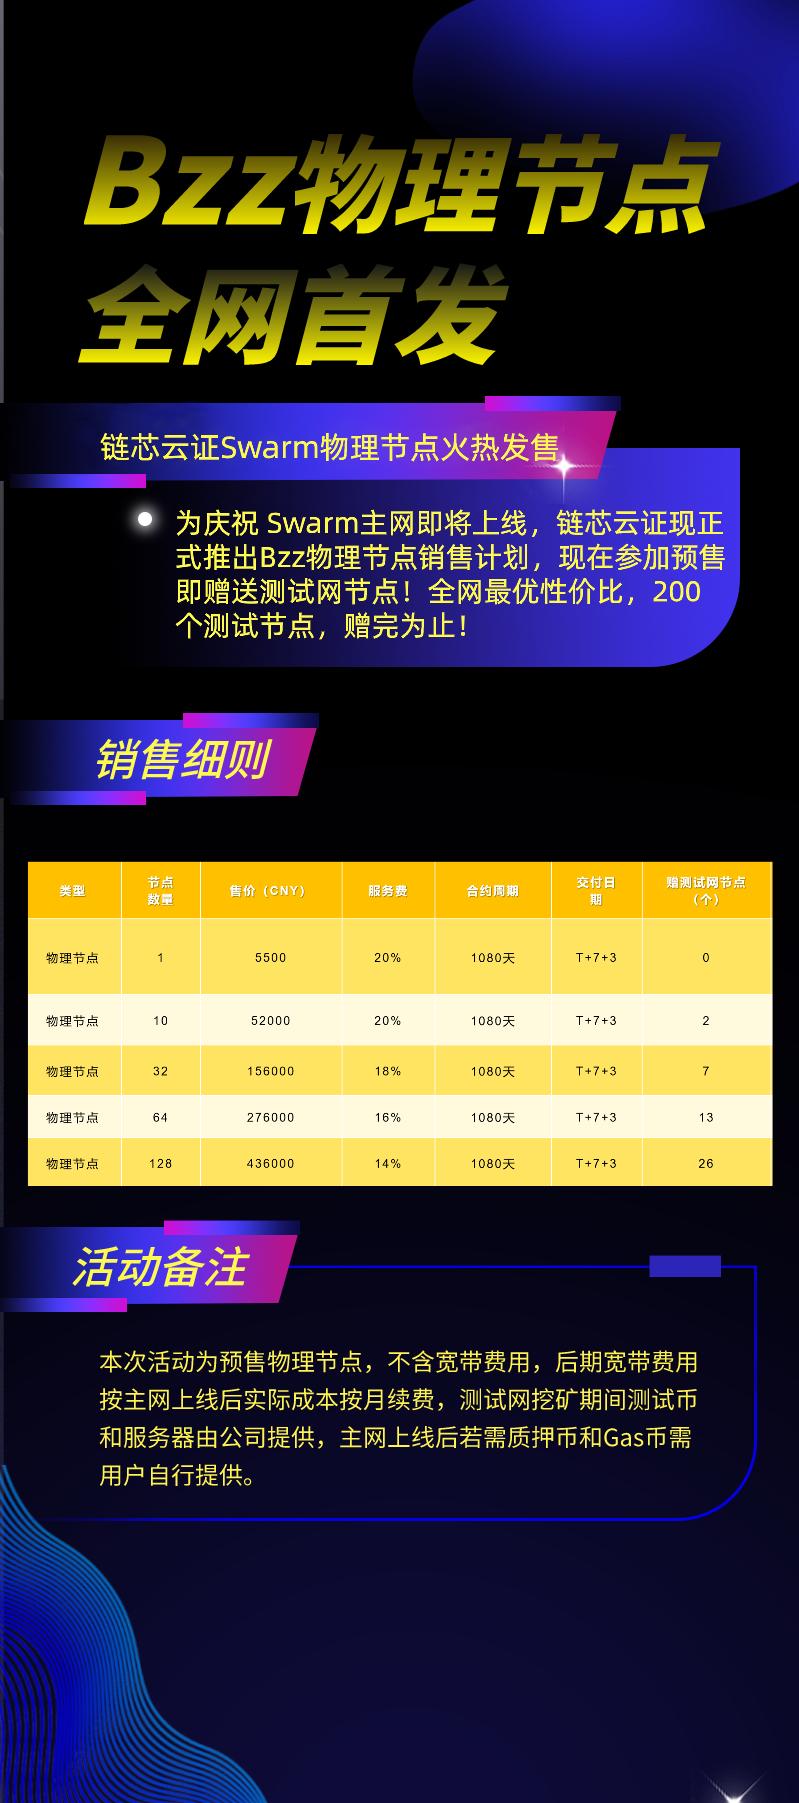 SWARM矿机为何要提早布局 swarm矿机价格